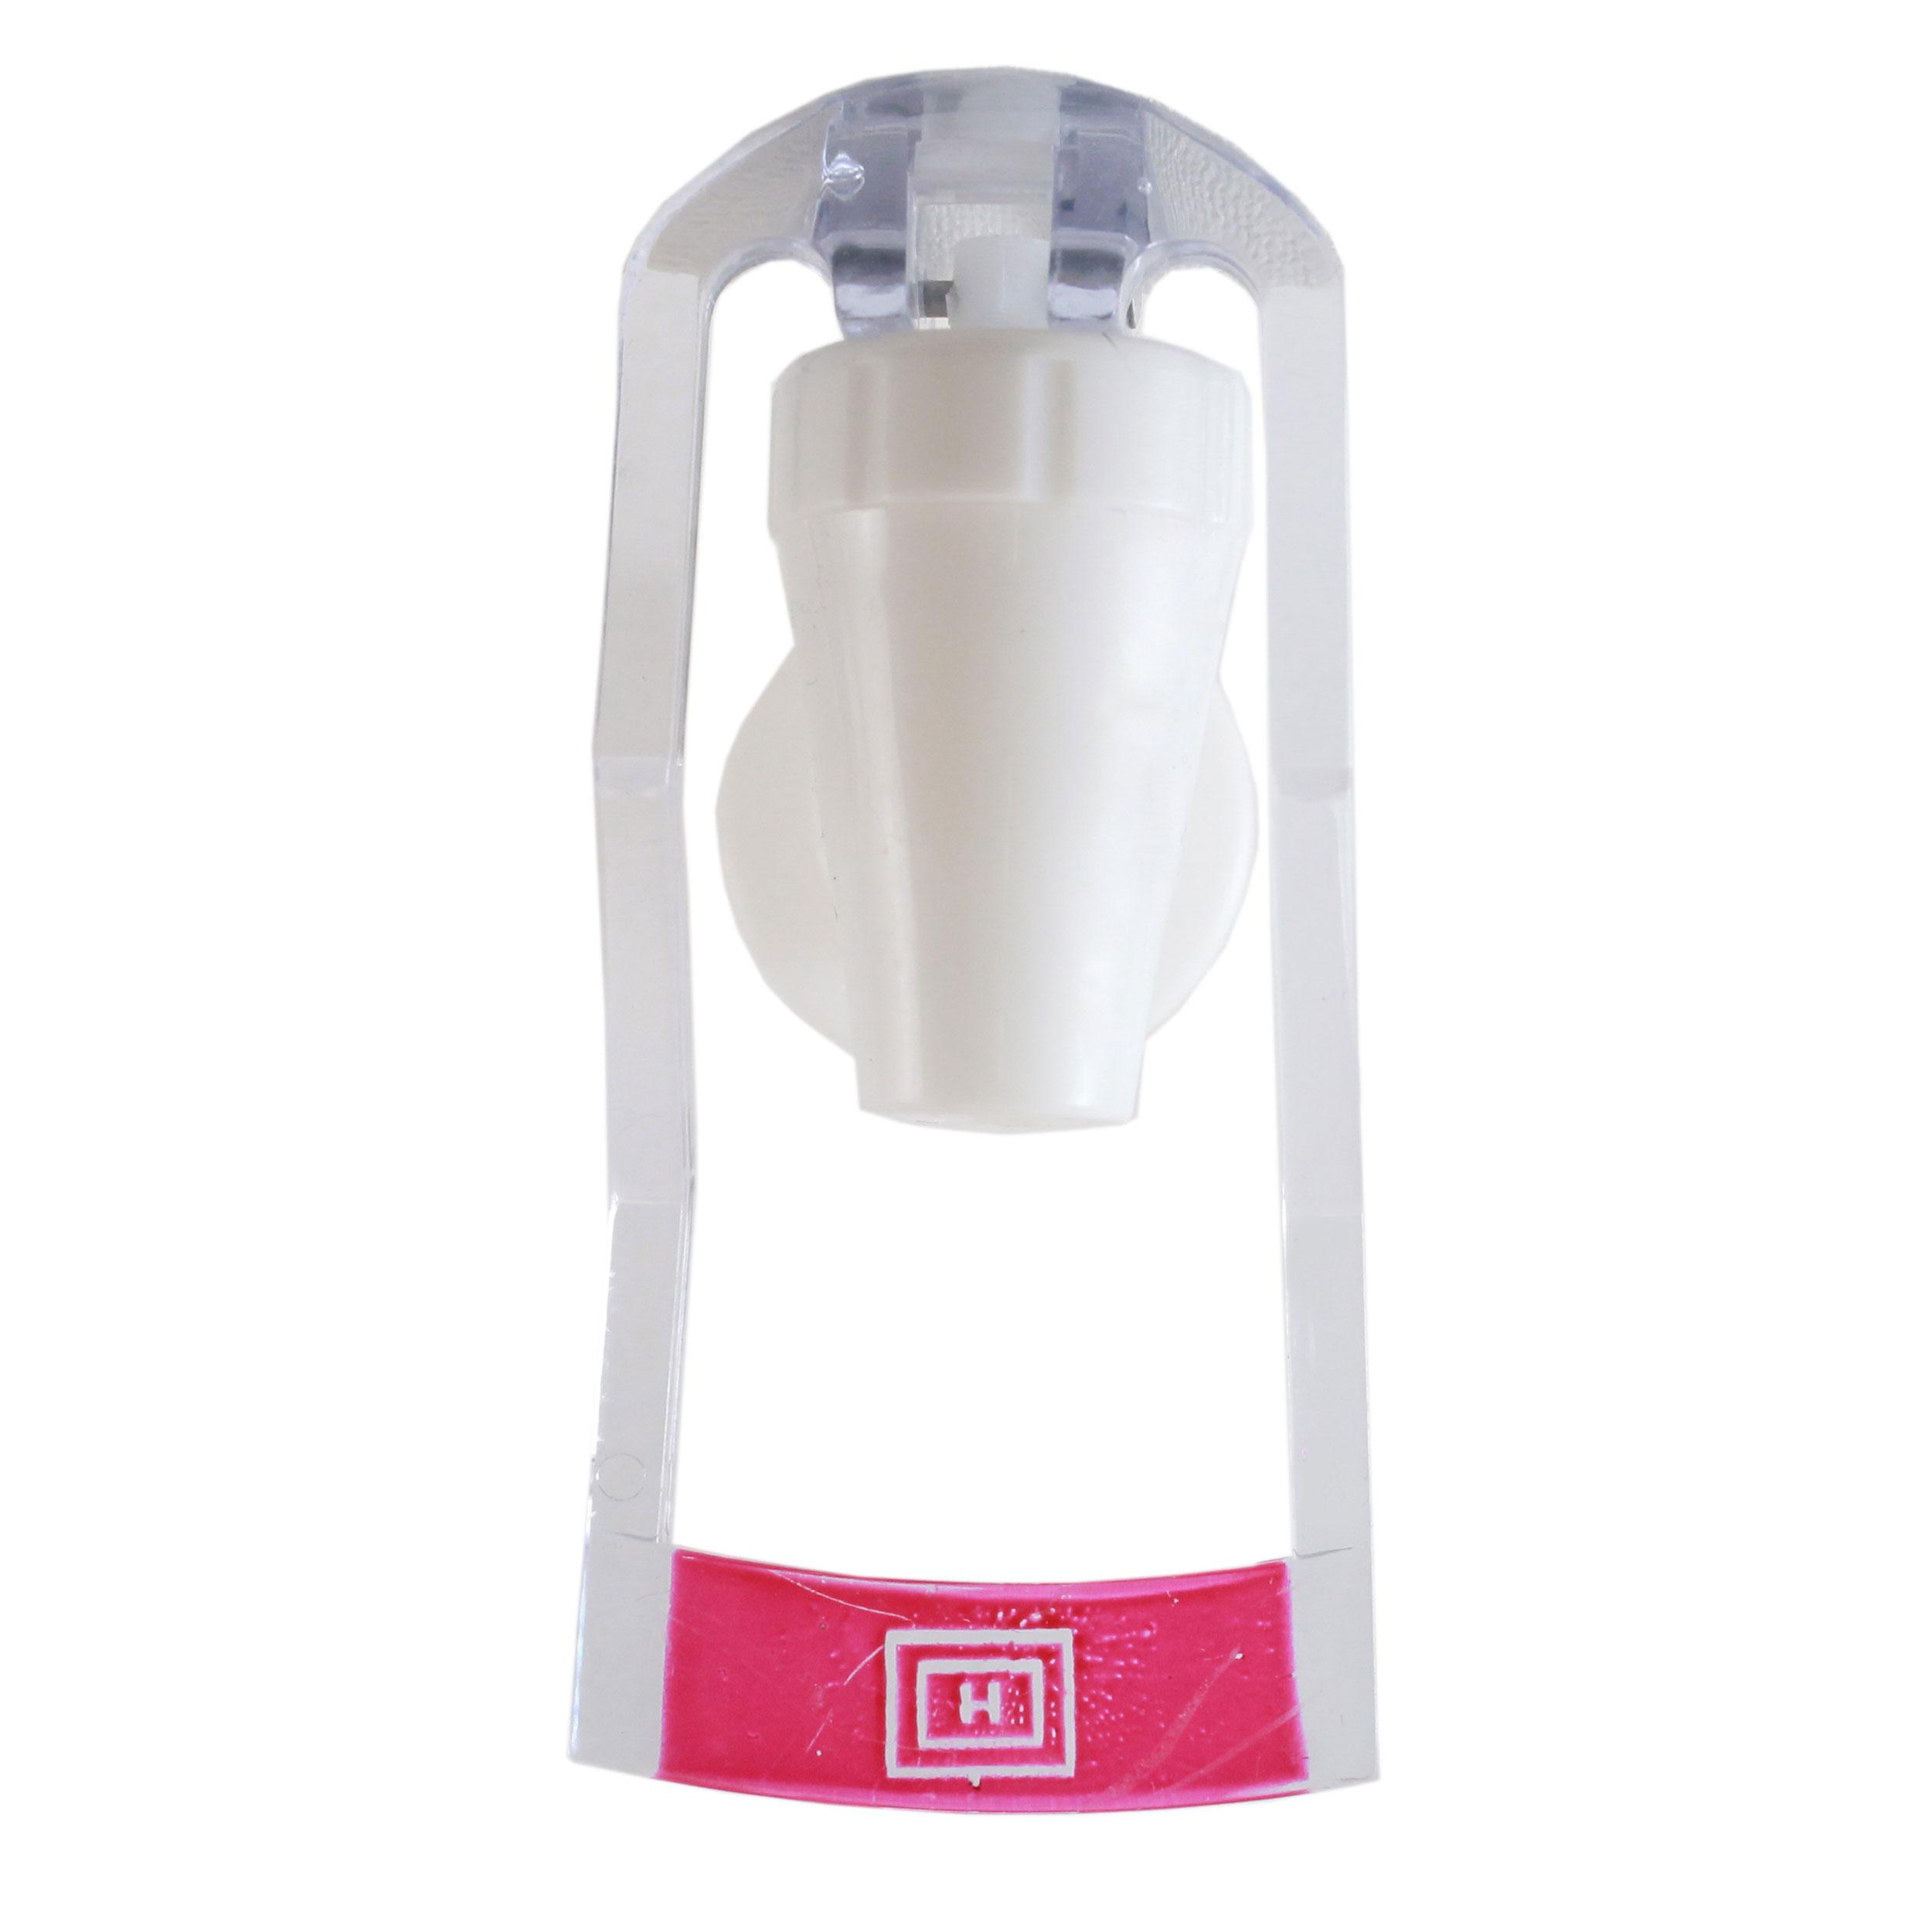 شیر آبسردکن مدل DN-H01